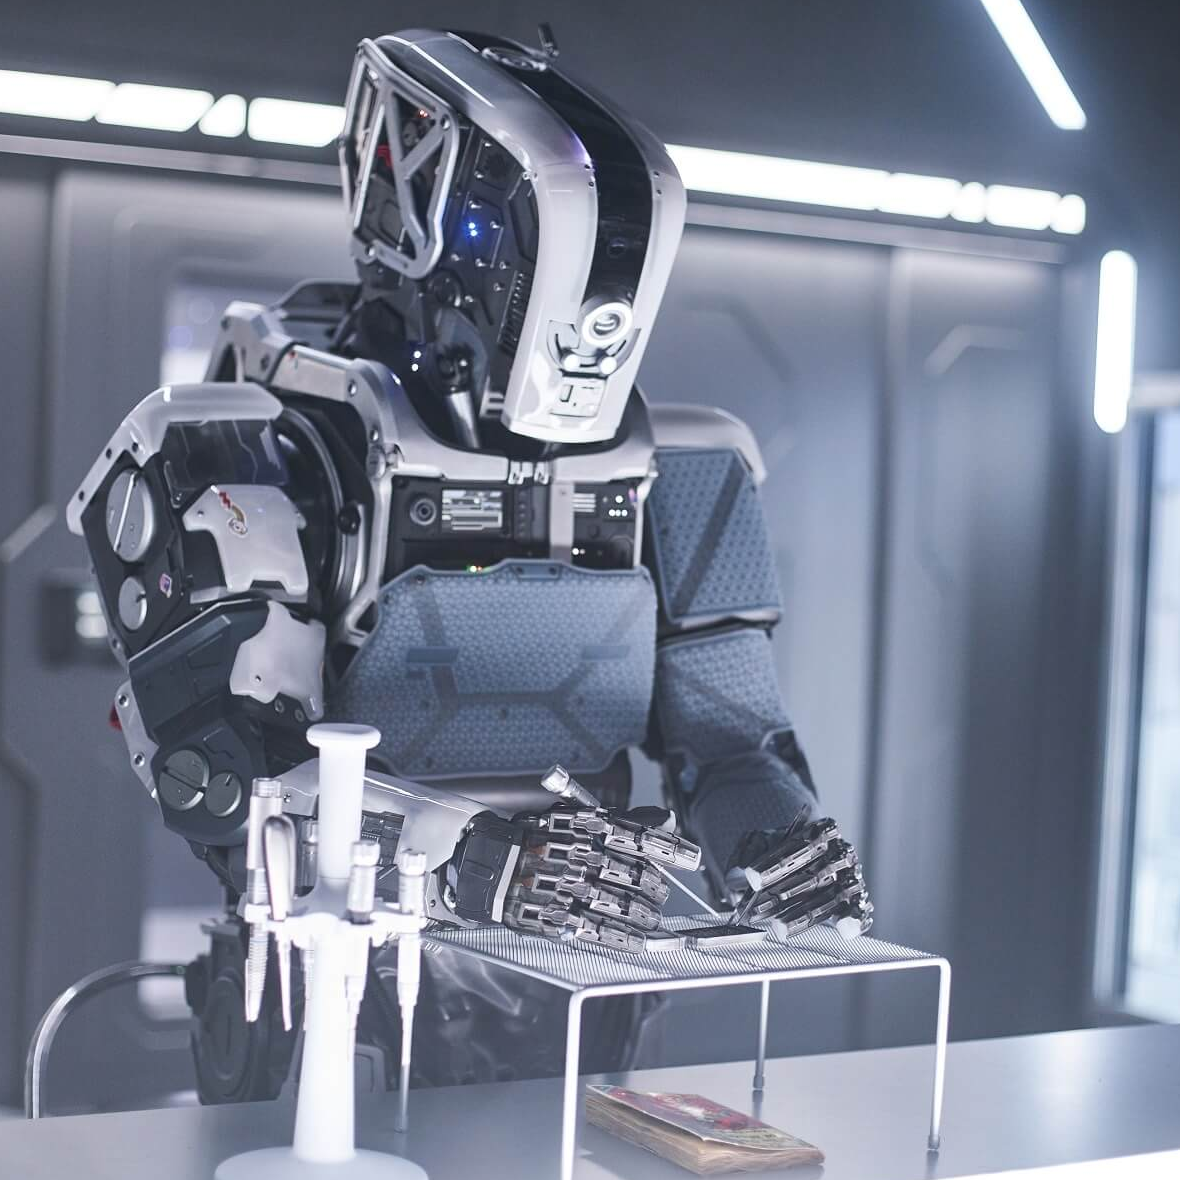 <p>《阿凡達》特效團隊打造  《AI終結戰》機器人演員竟「近在眼前」</p>